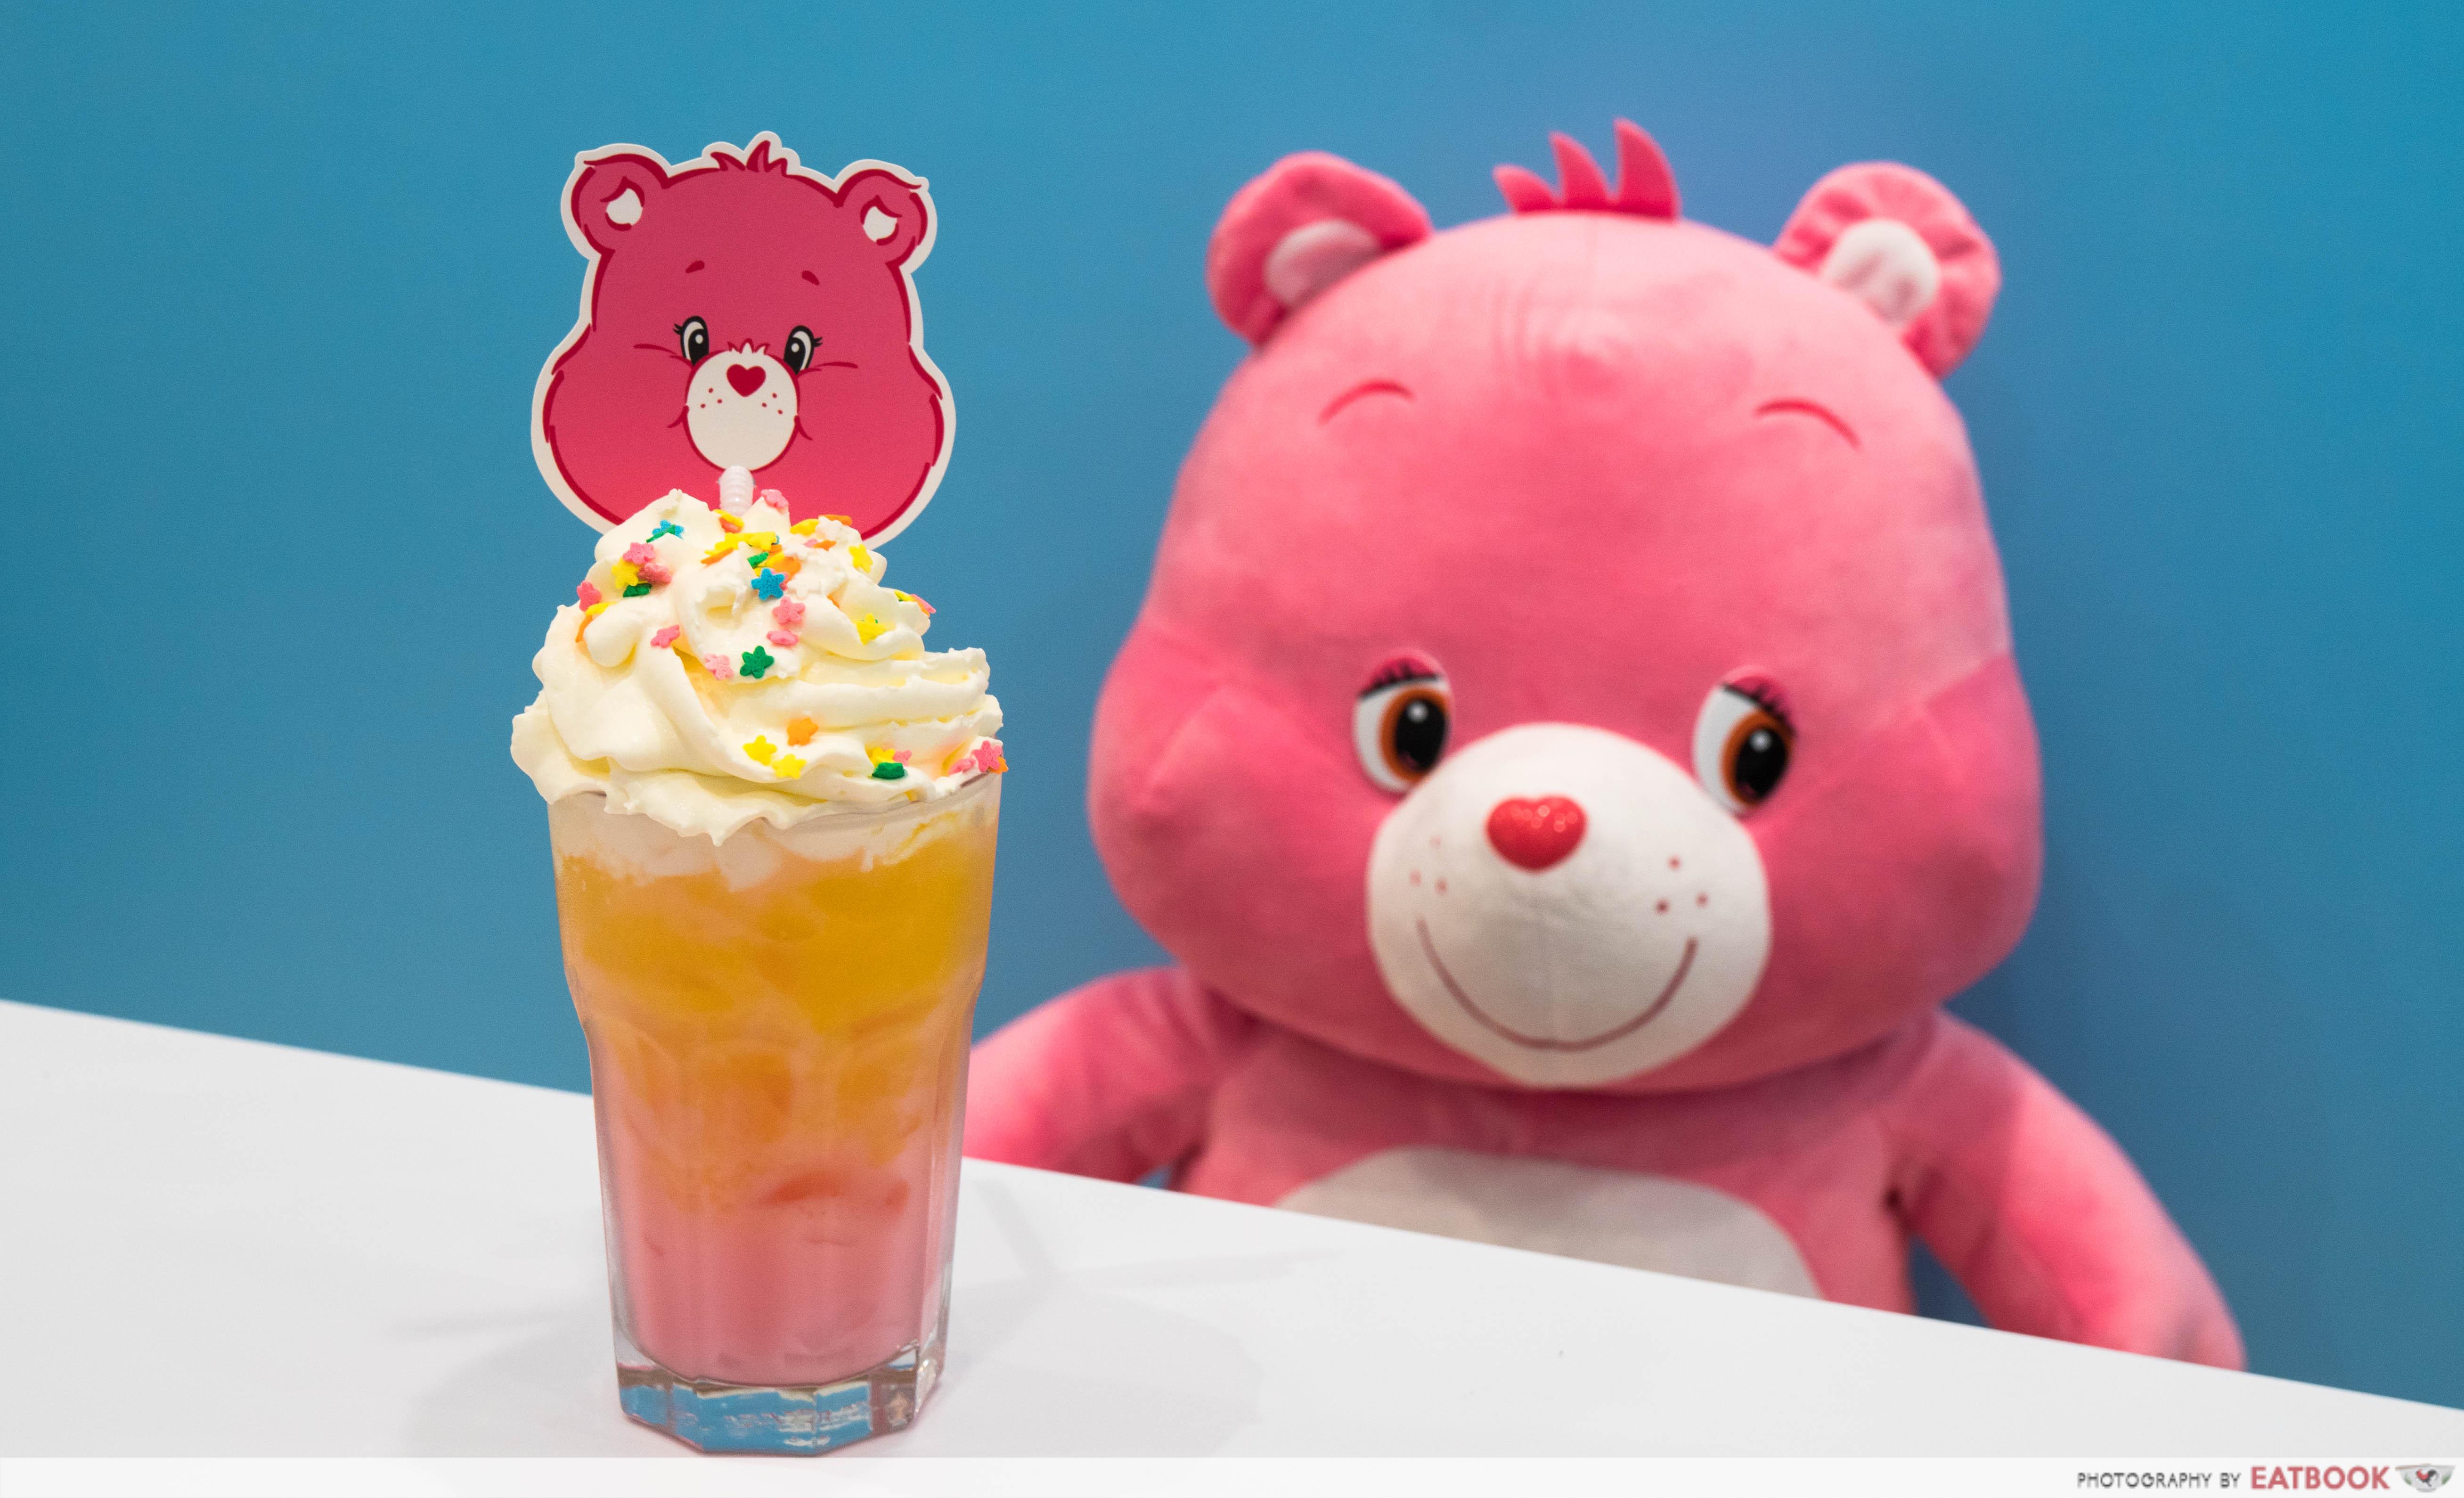 Care Bears Cafe - care bear drink